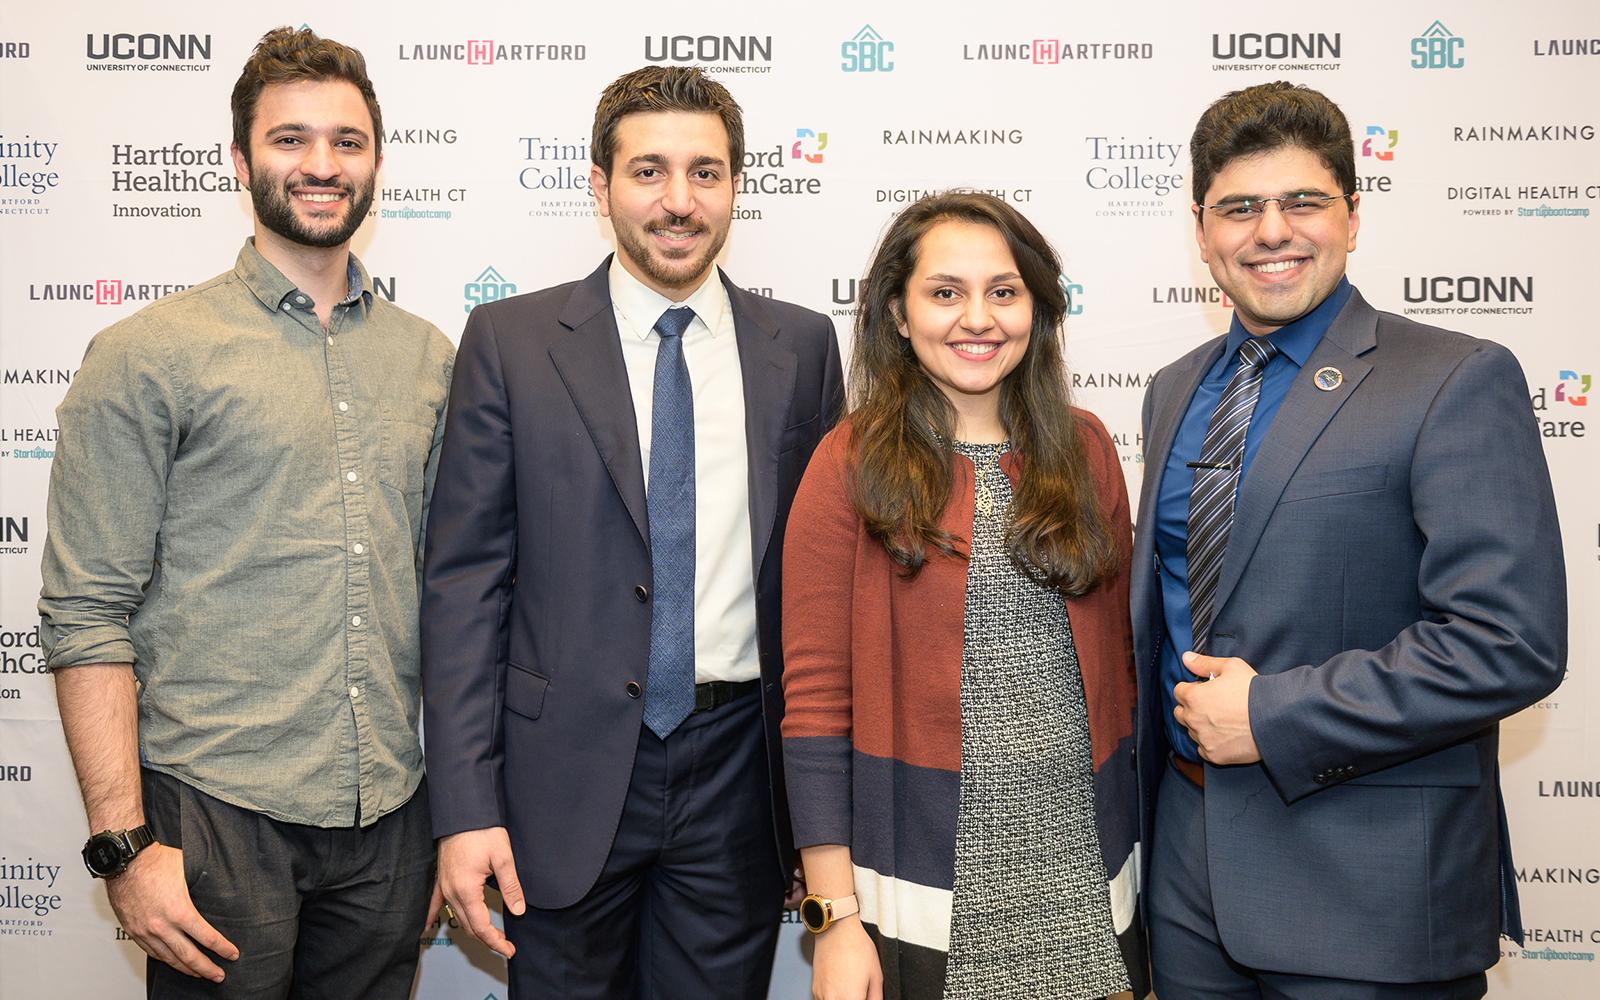 Khashayar Dashti, co-founder and COO for QRfertile; Reza Amin, Ph.D., co-founder and CEO of QRfertile; Leila Daneshmandi, co-founder of Encapsulate, and Armin Tahmasbi Rad, co-founder and CEO of Encapsulate. (Nathan Oldham / UConn School of Business)